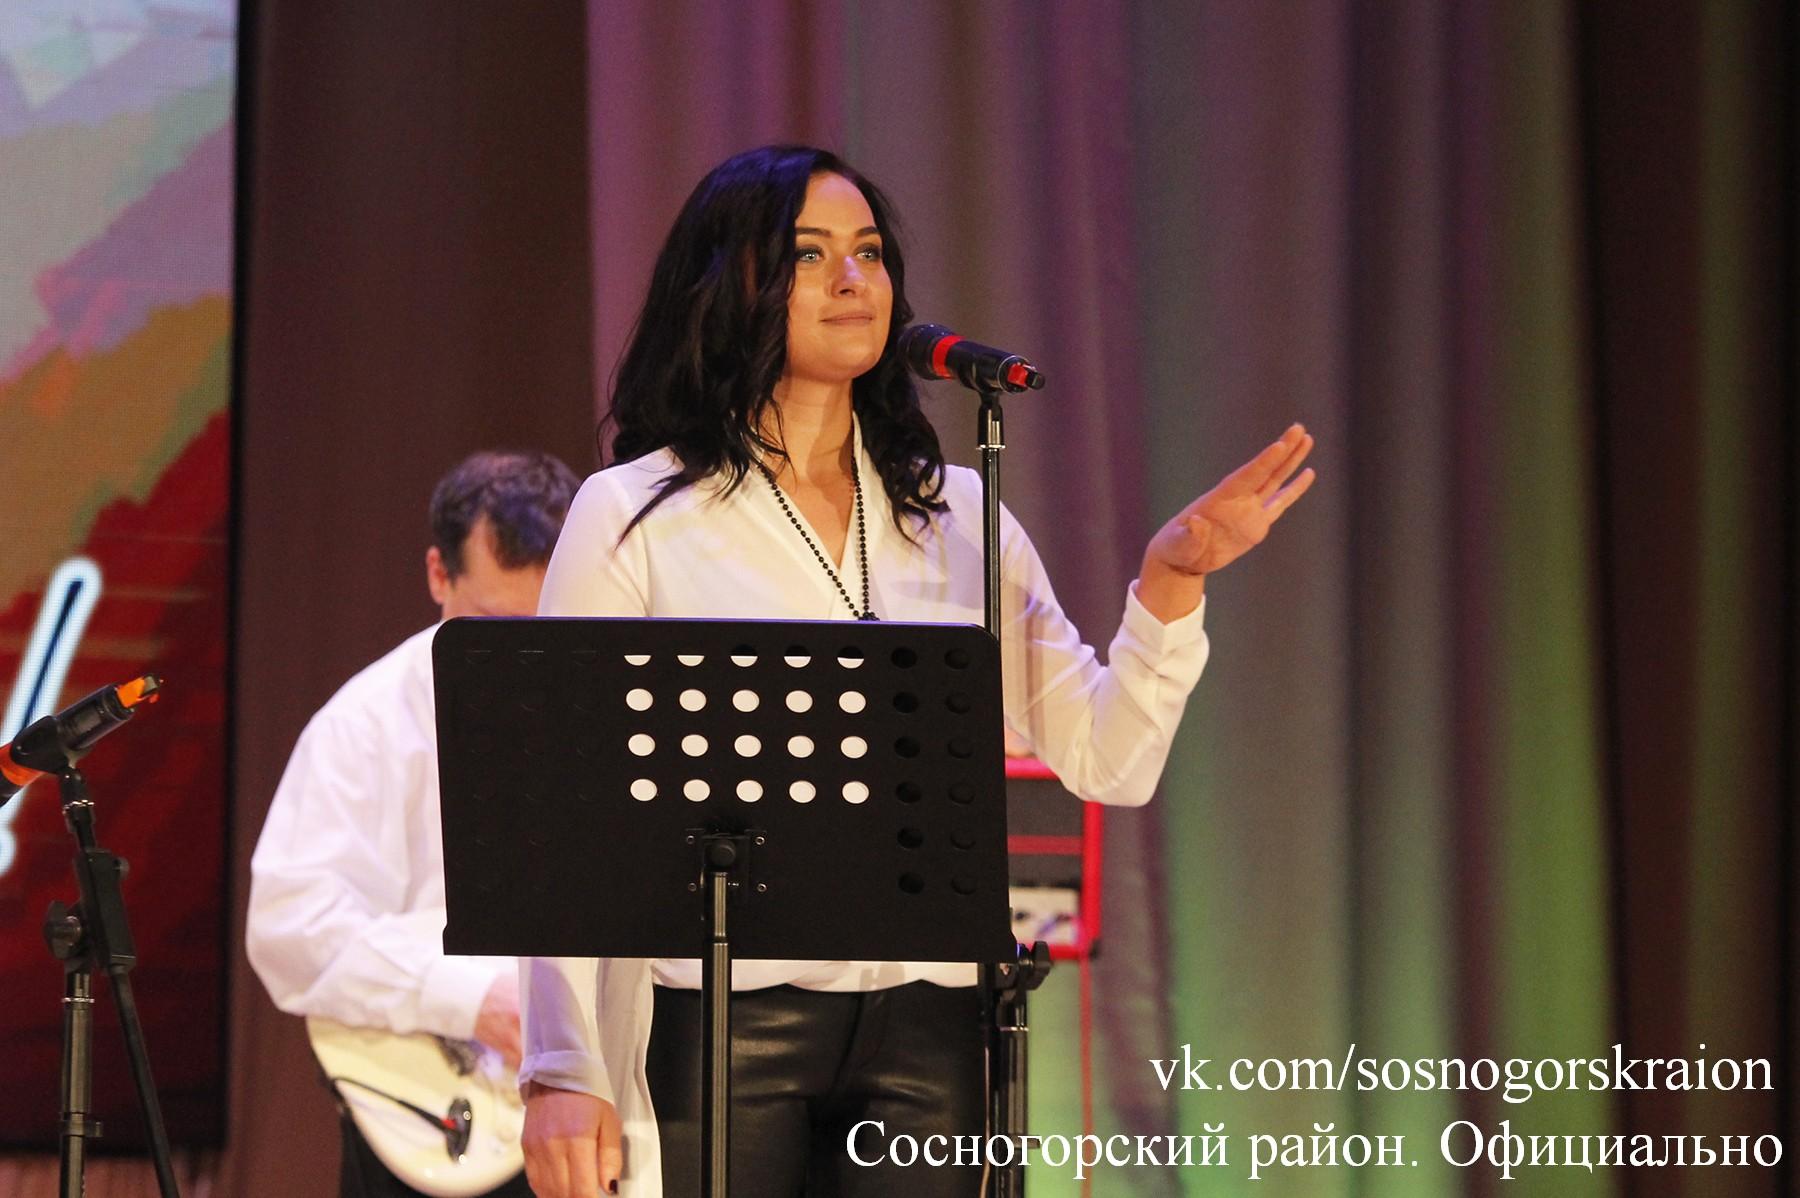 Kseniya-Tatarnikova.jpg